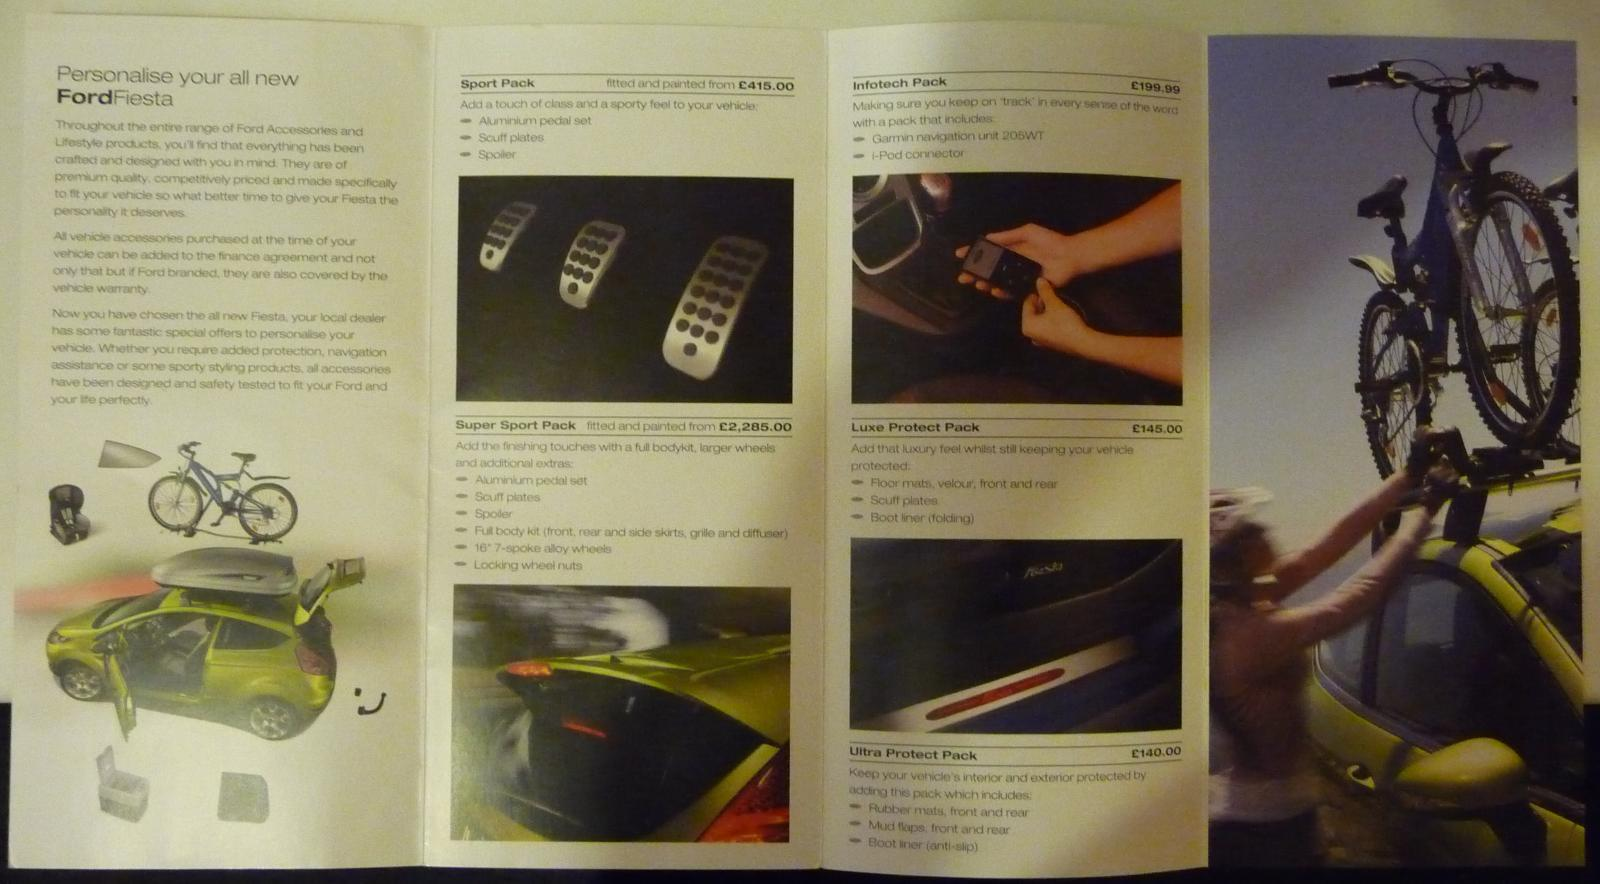 Ford Fiesta Accessory Brochure 2009 Part 1